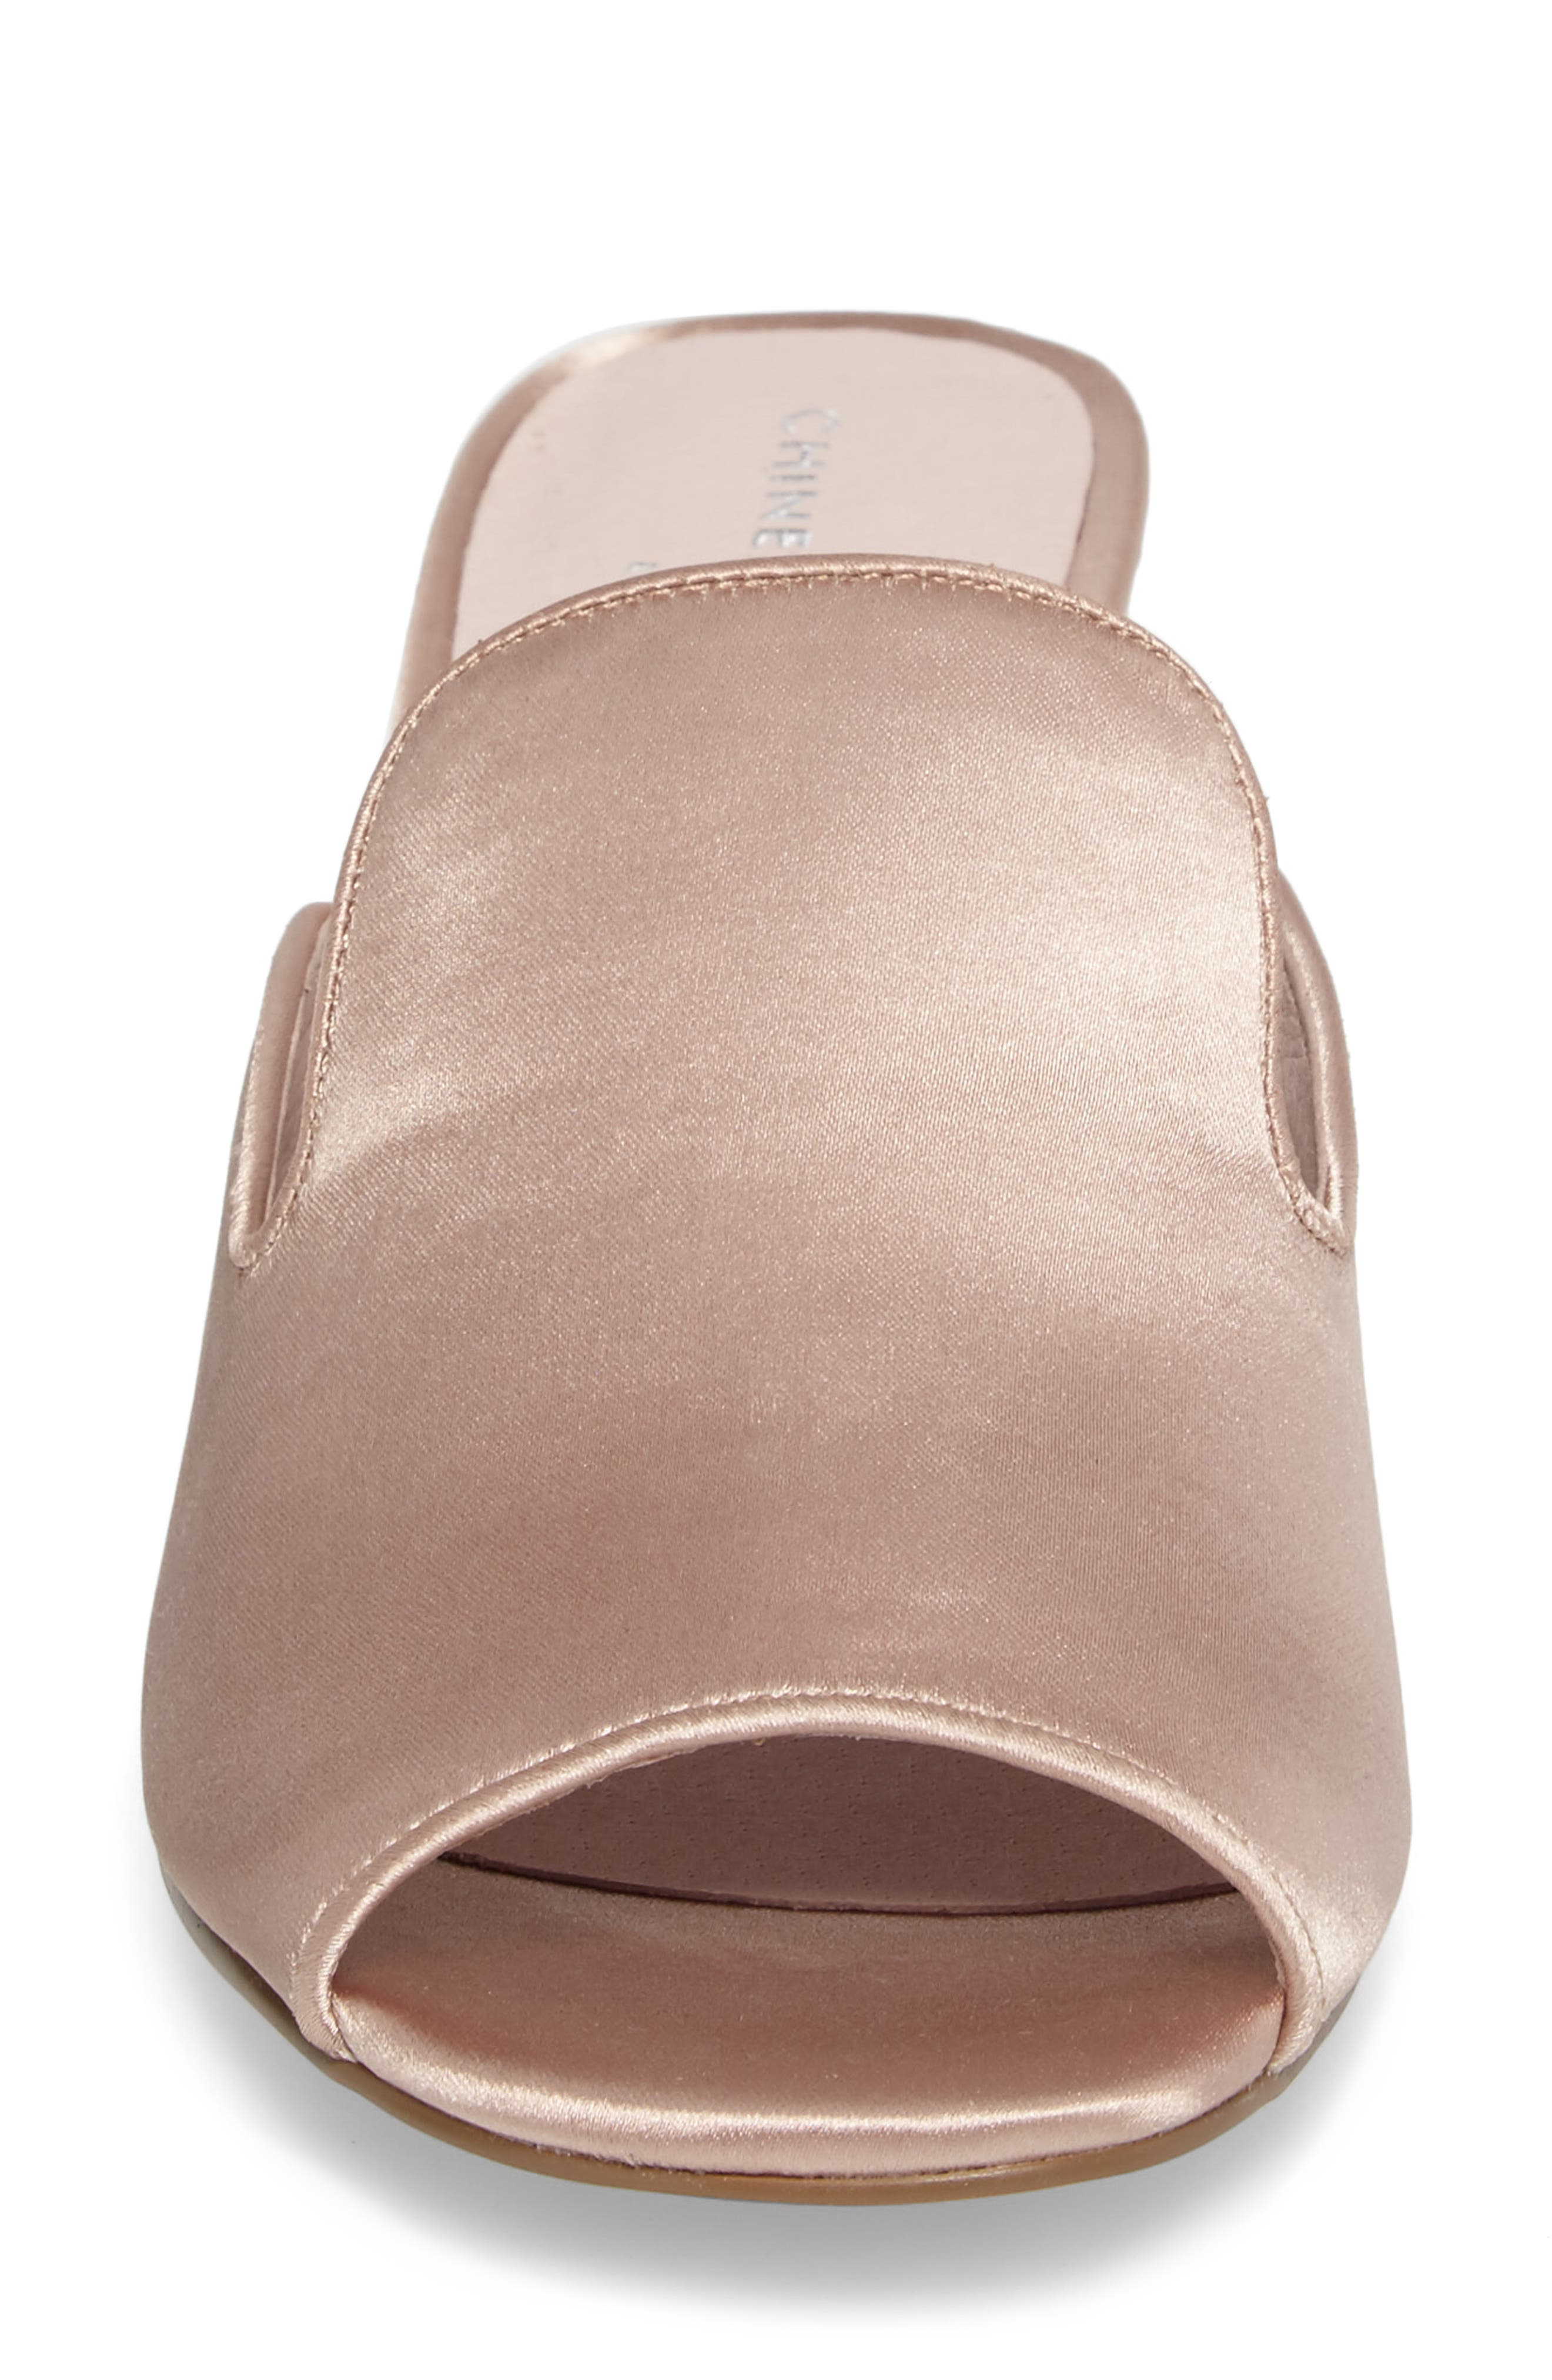 Mara Glitter Loafer Mule,                             Alternate thumbnail 4, color,                             Summer Nude Satin